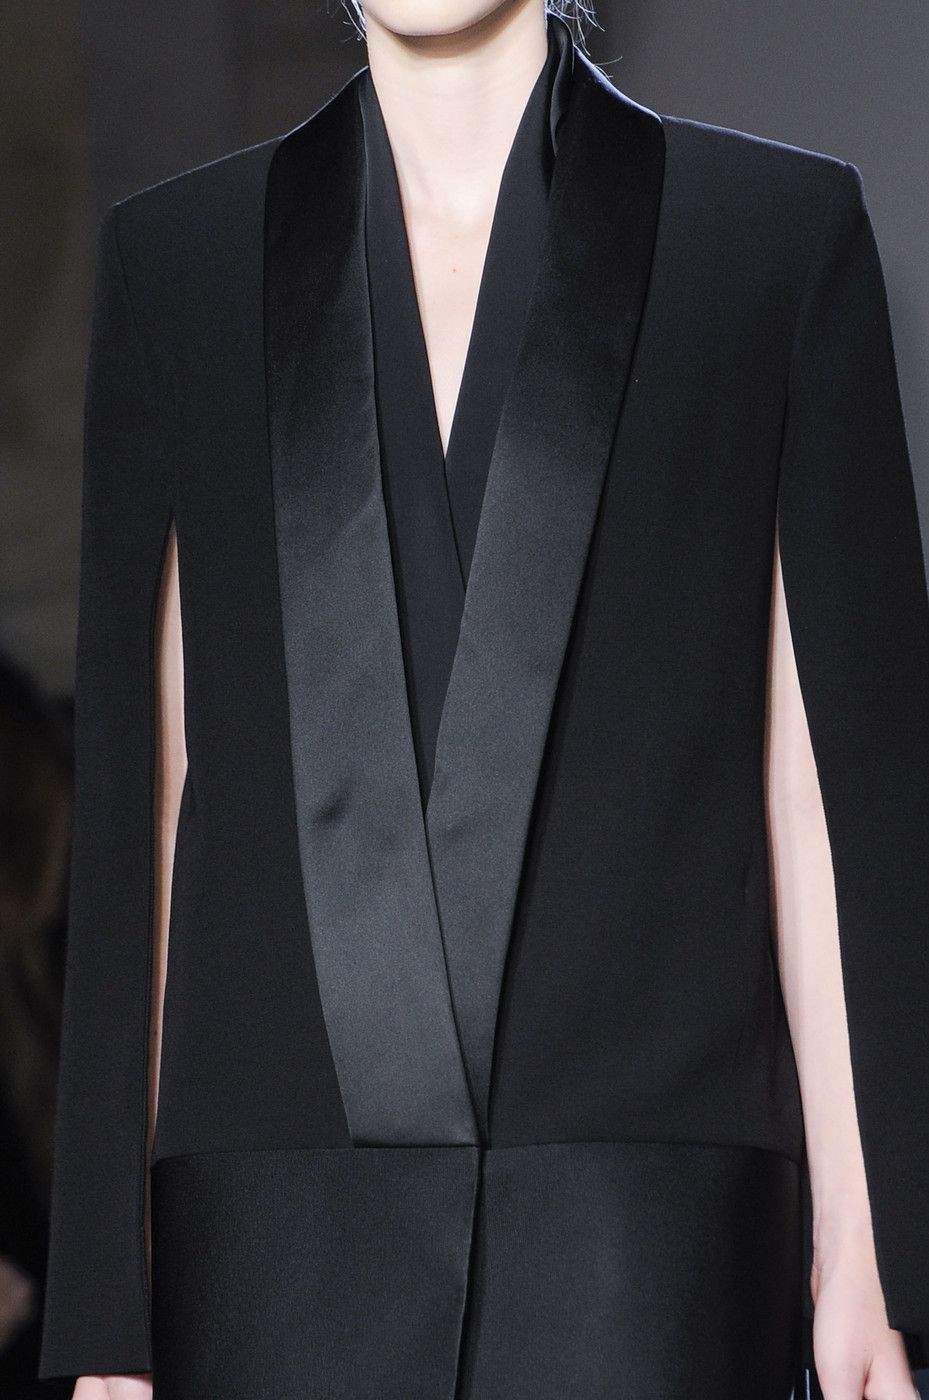 Sleek black cape blazer, chic fashion details // Victoria Beckham Fall 2013